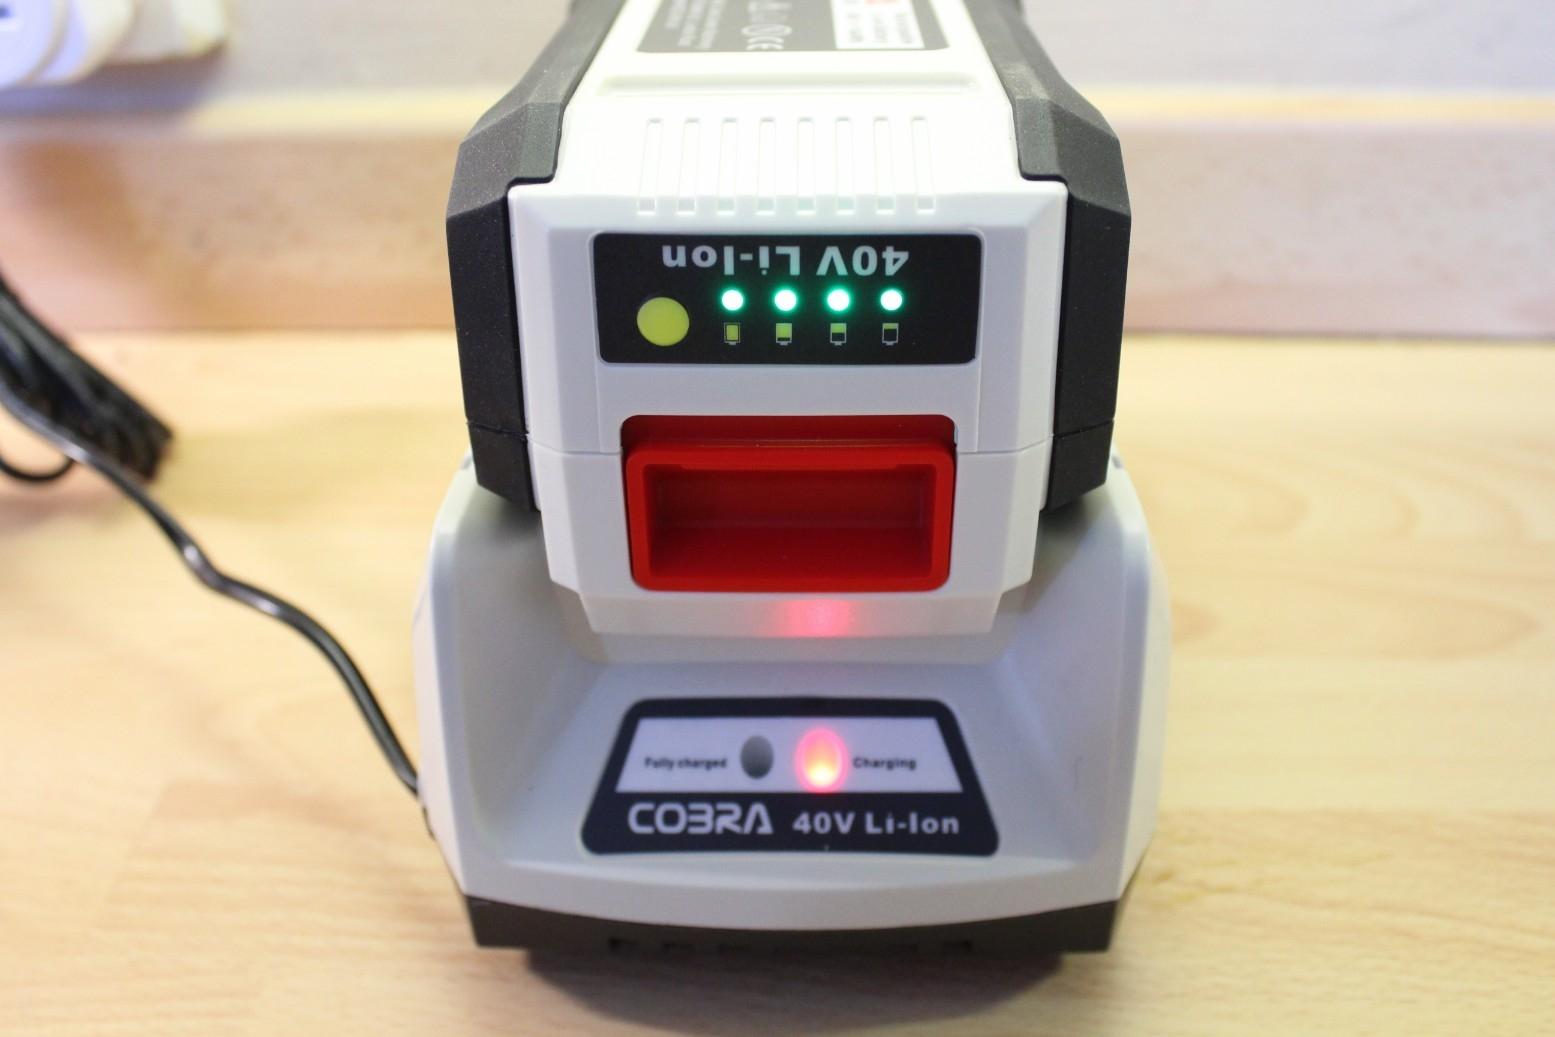 Cobra MX4140V Lithium-ion 40V Cordless Lawnmower - Review (3)